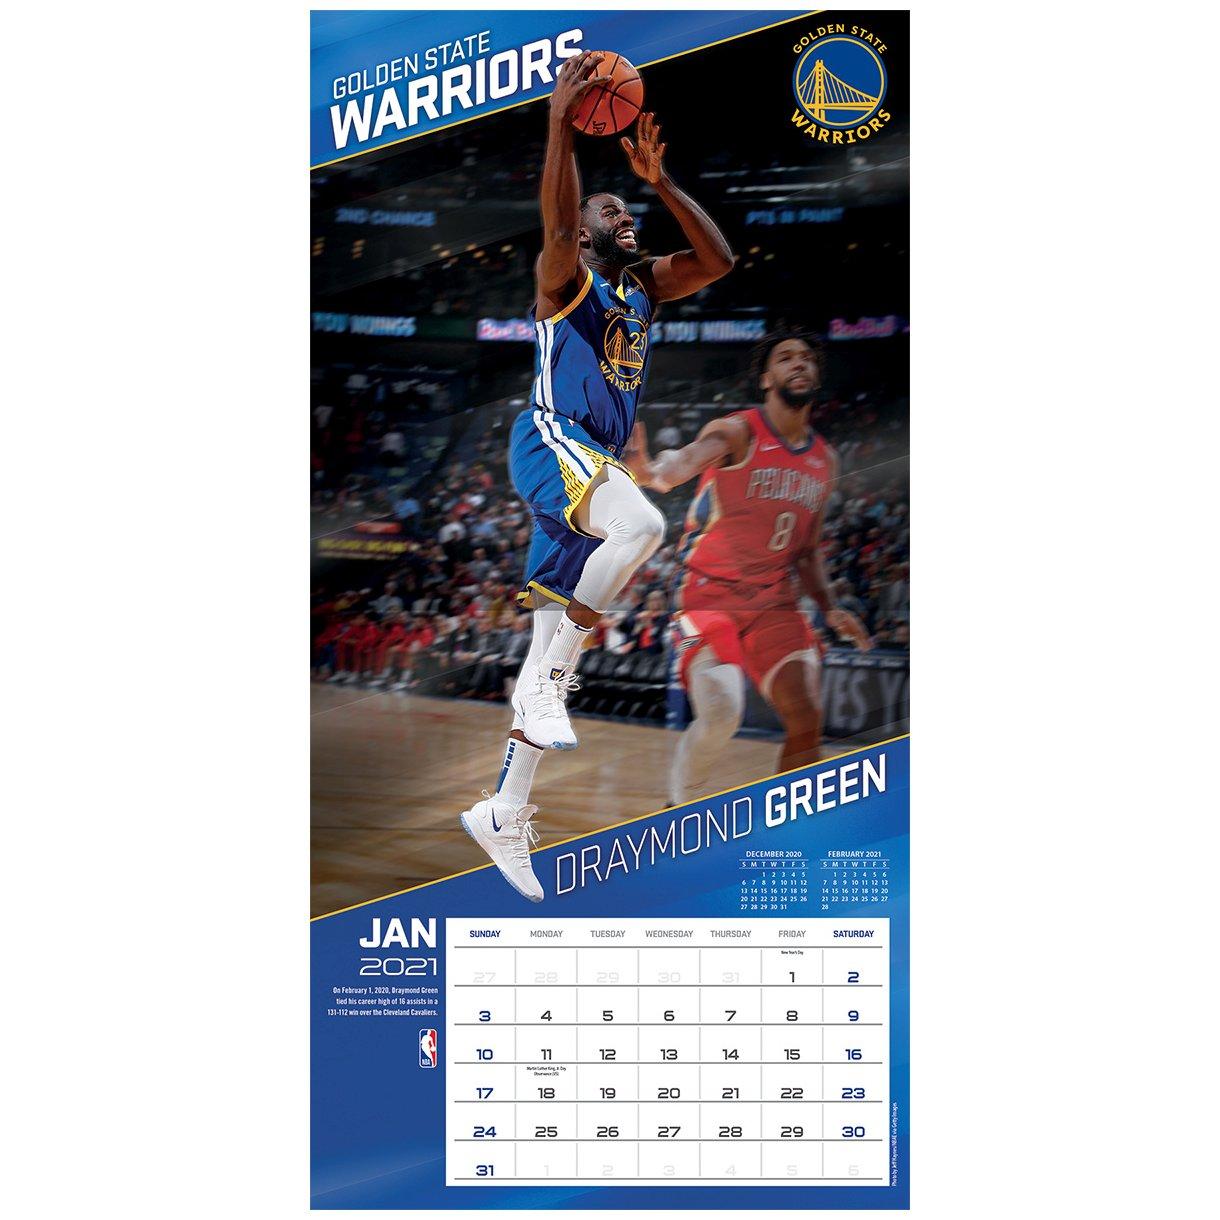 Turner NBA 30x30cm Wall Calendar 2021 Golden State Warriors - One Size | eBay